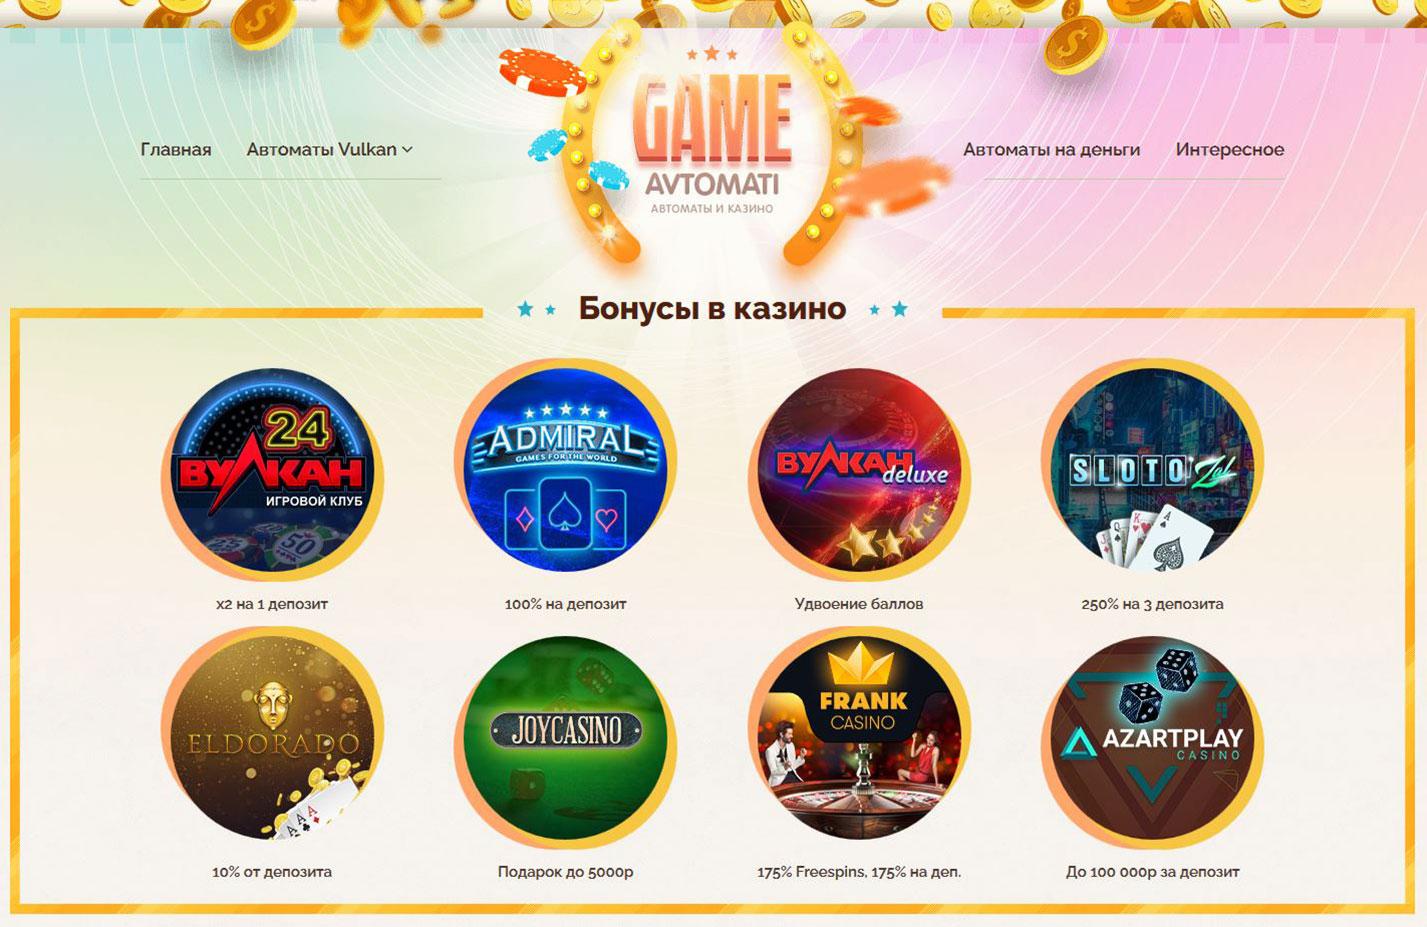 бонусы в онлайн казино Ru.Game-avtomatii